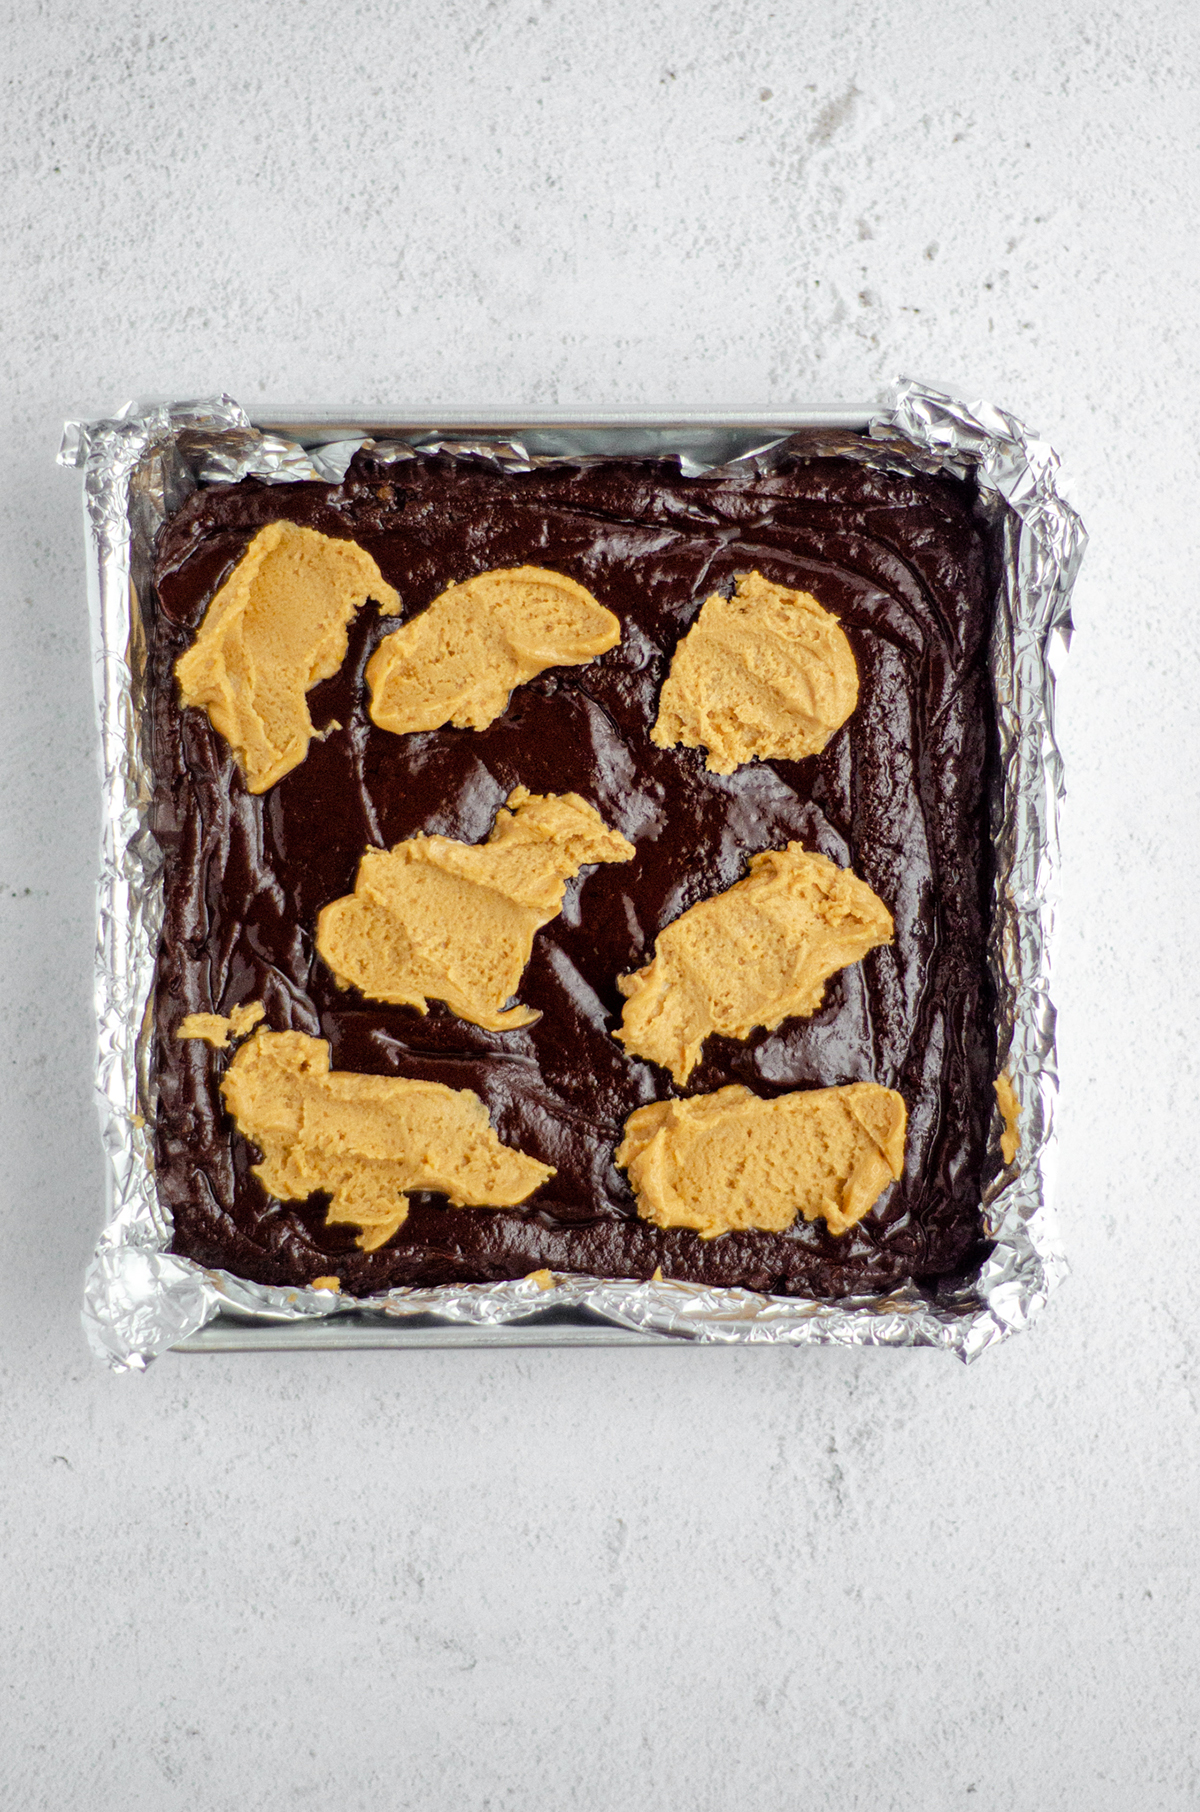 peanut butter cookie dollops on top of brownie batter to make peanut butter cookie brownies